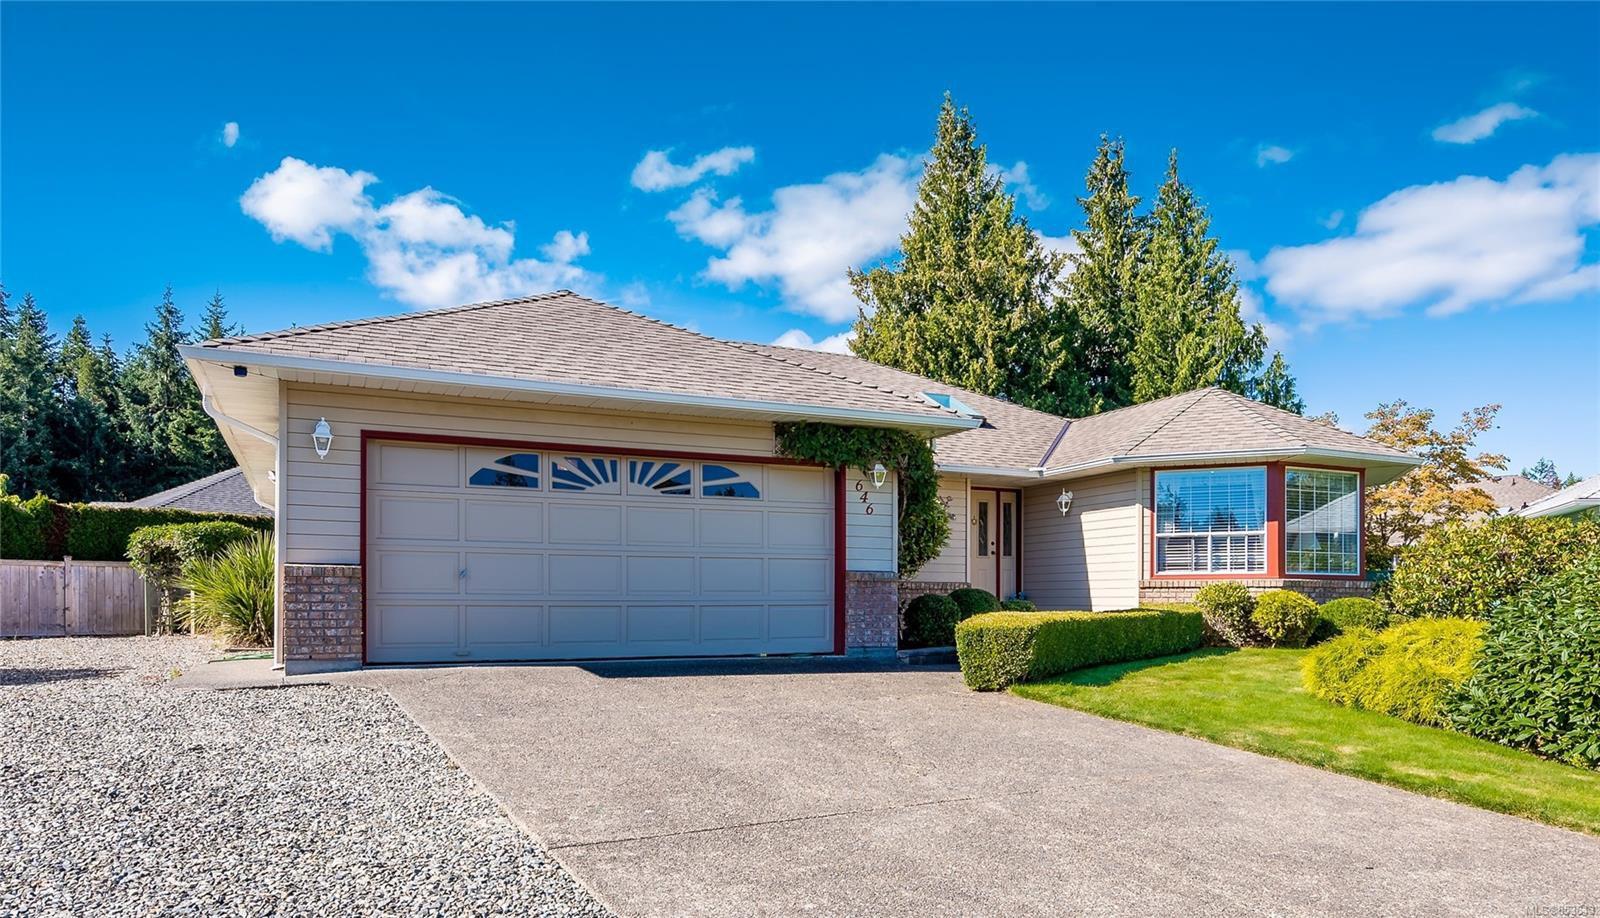 Main Photo: 646 Redwood Dr in : PQ Qualicum Beach House for sale (Parksville/Qualicum)  : MLS®# 853643